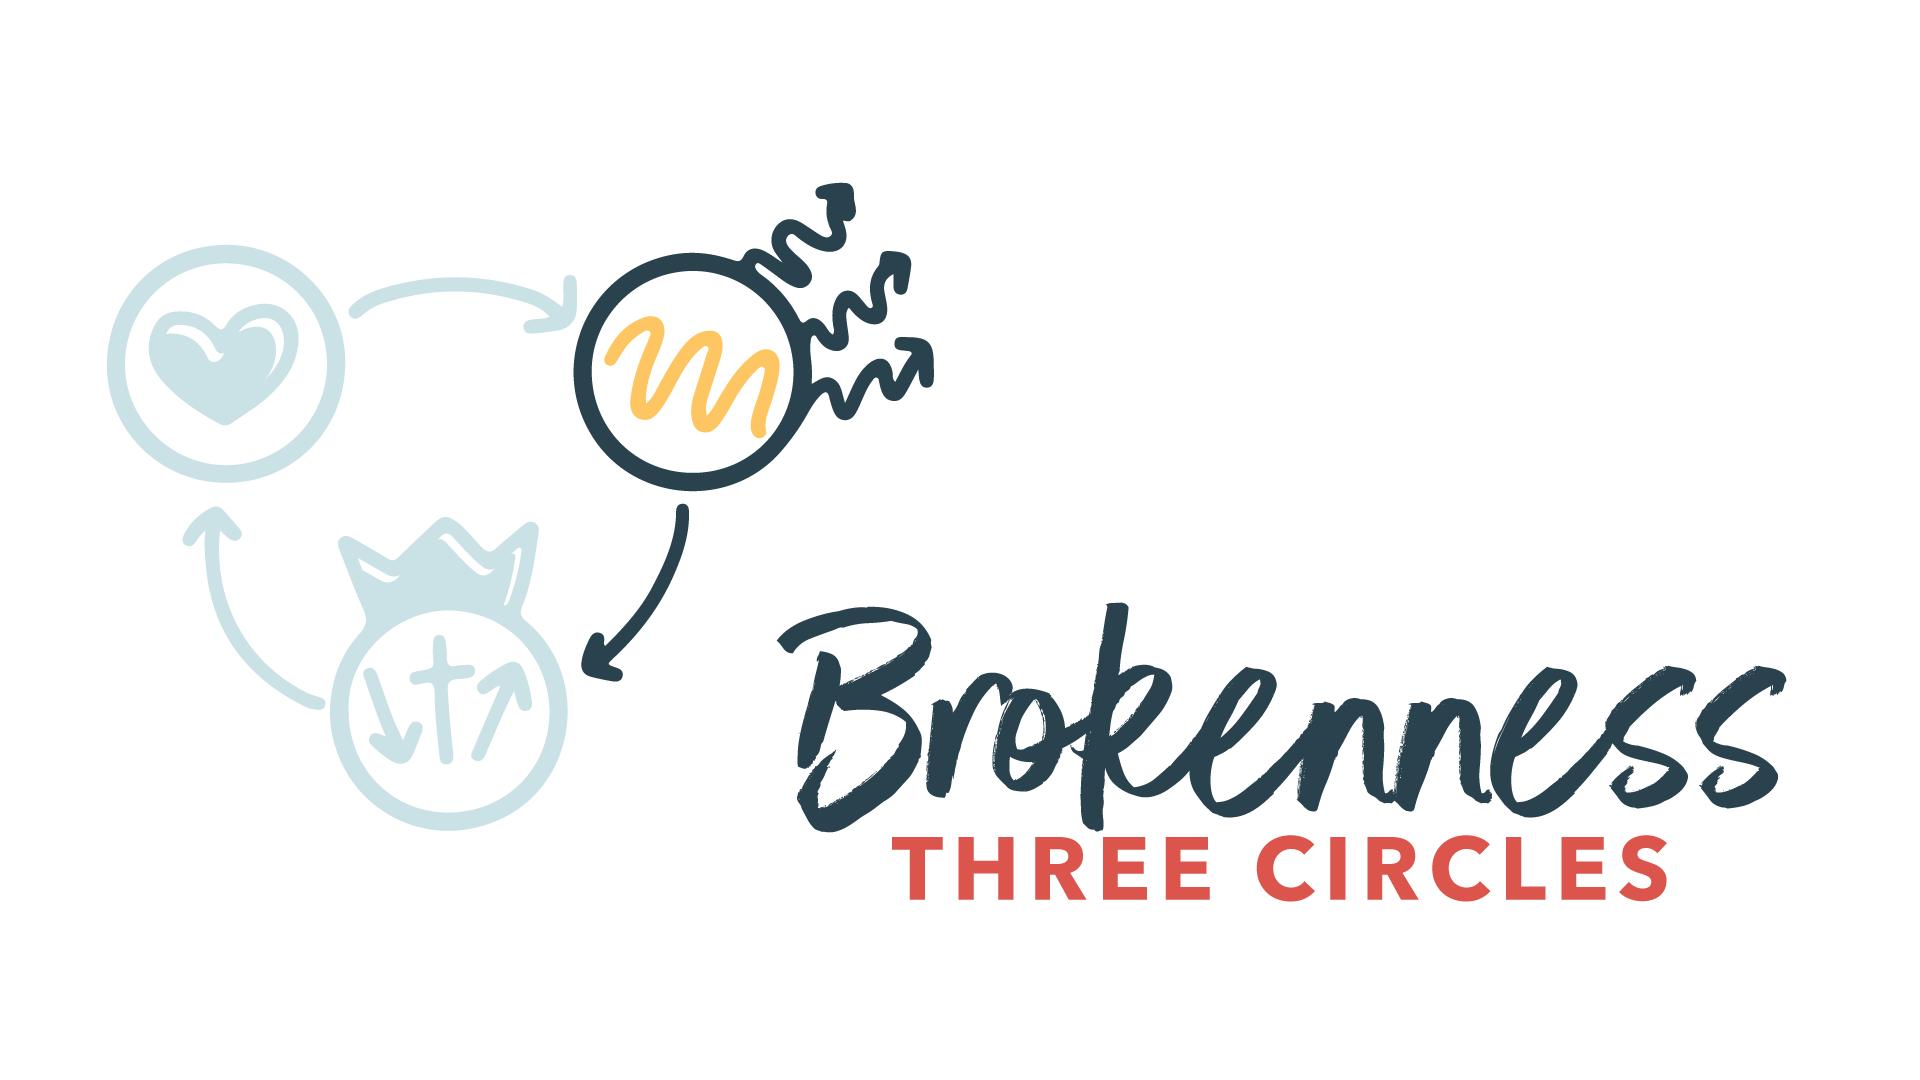 3 Circles Part 2